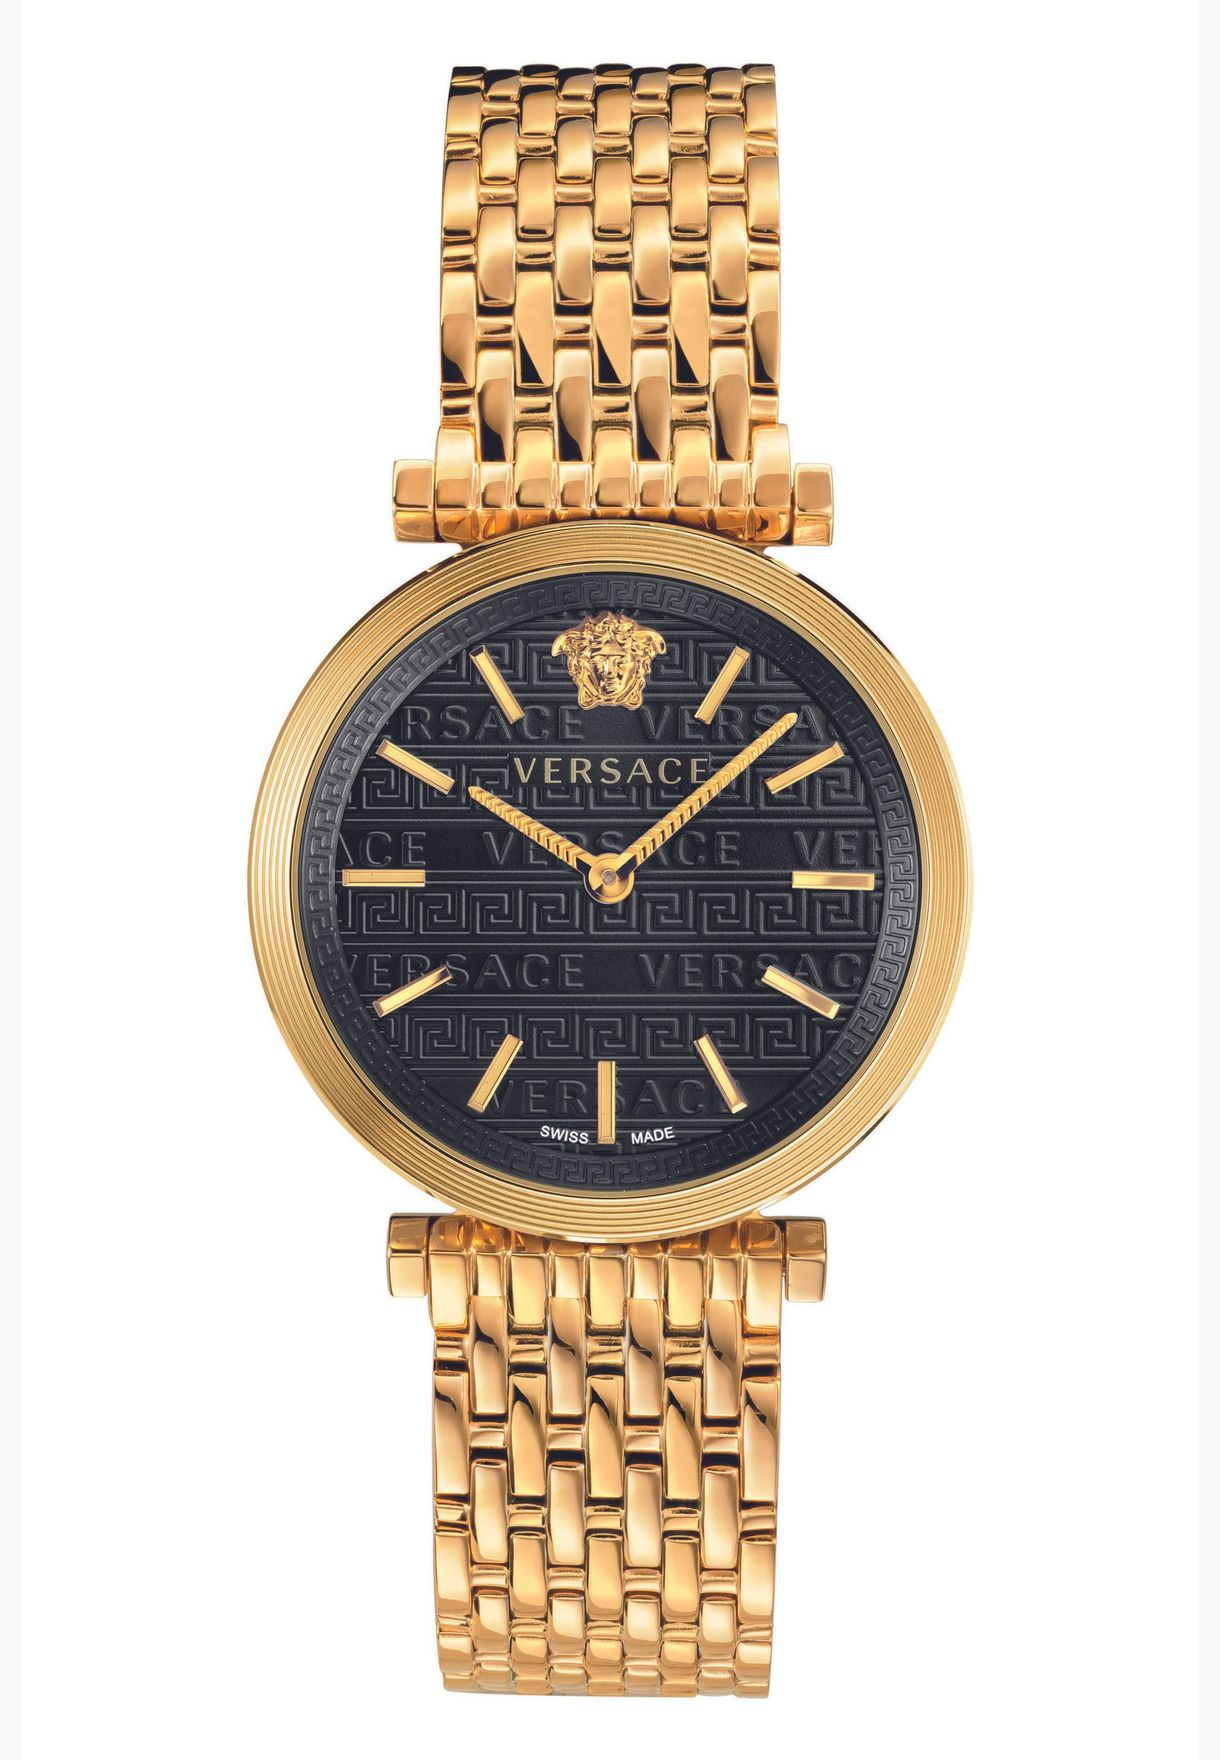 ساعة فيرساتشي تويست بسوار ستانلس ستيل للنساء - VELS00819